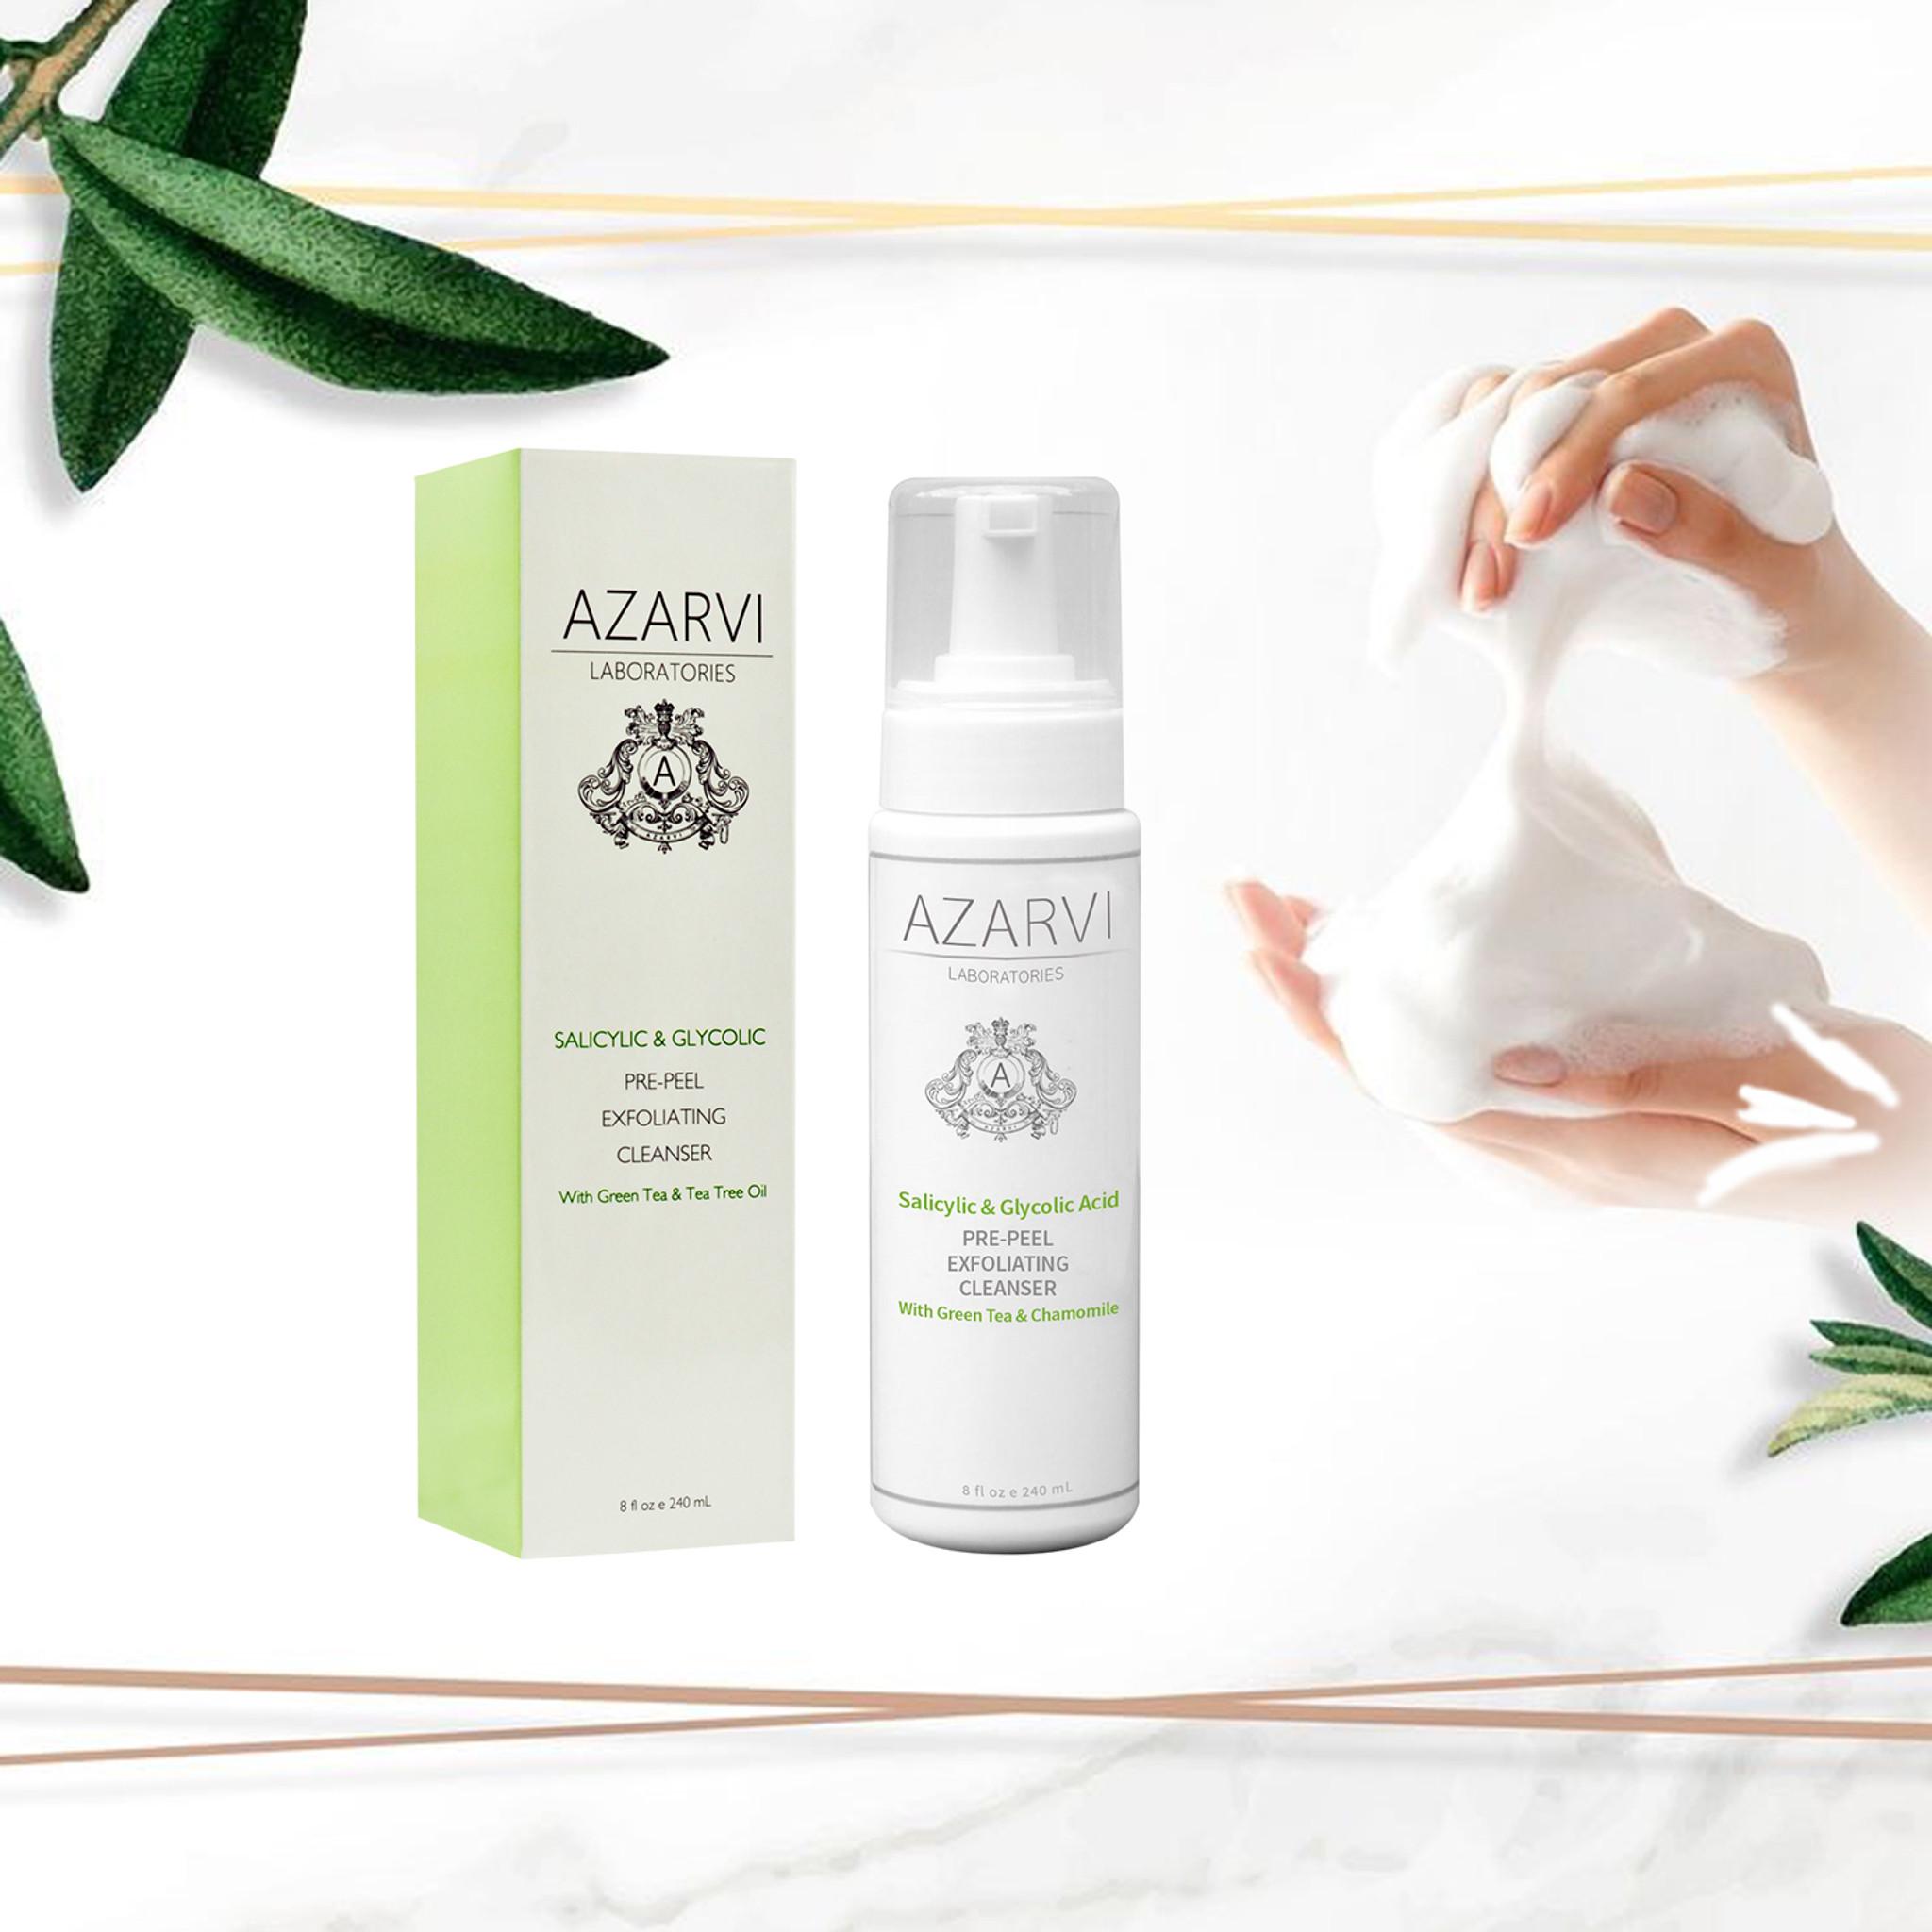 Azarvi Salicylic & Glycolic Acid Pre-Peel Exfoliating Cleanser